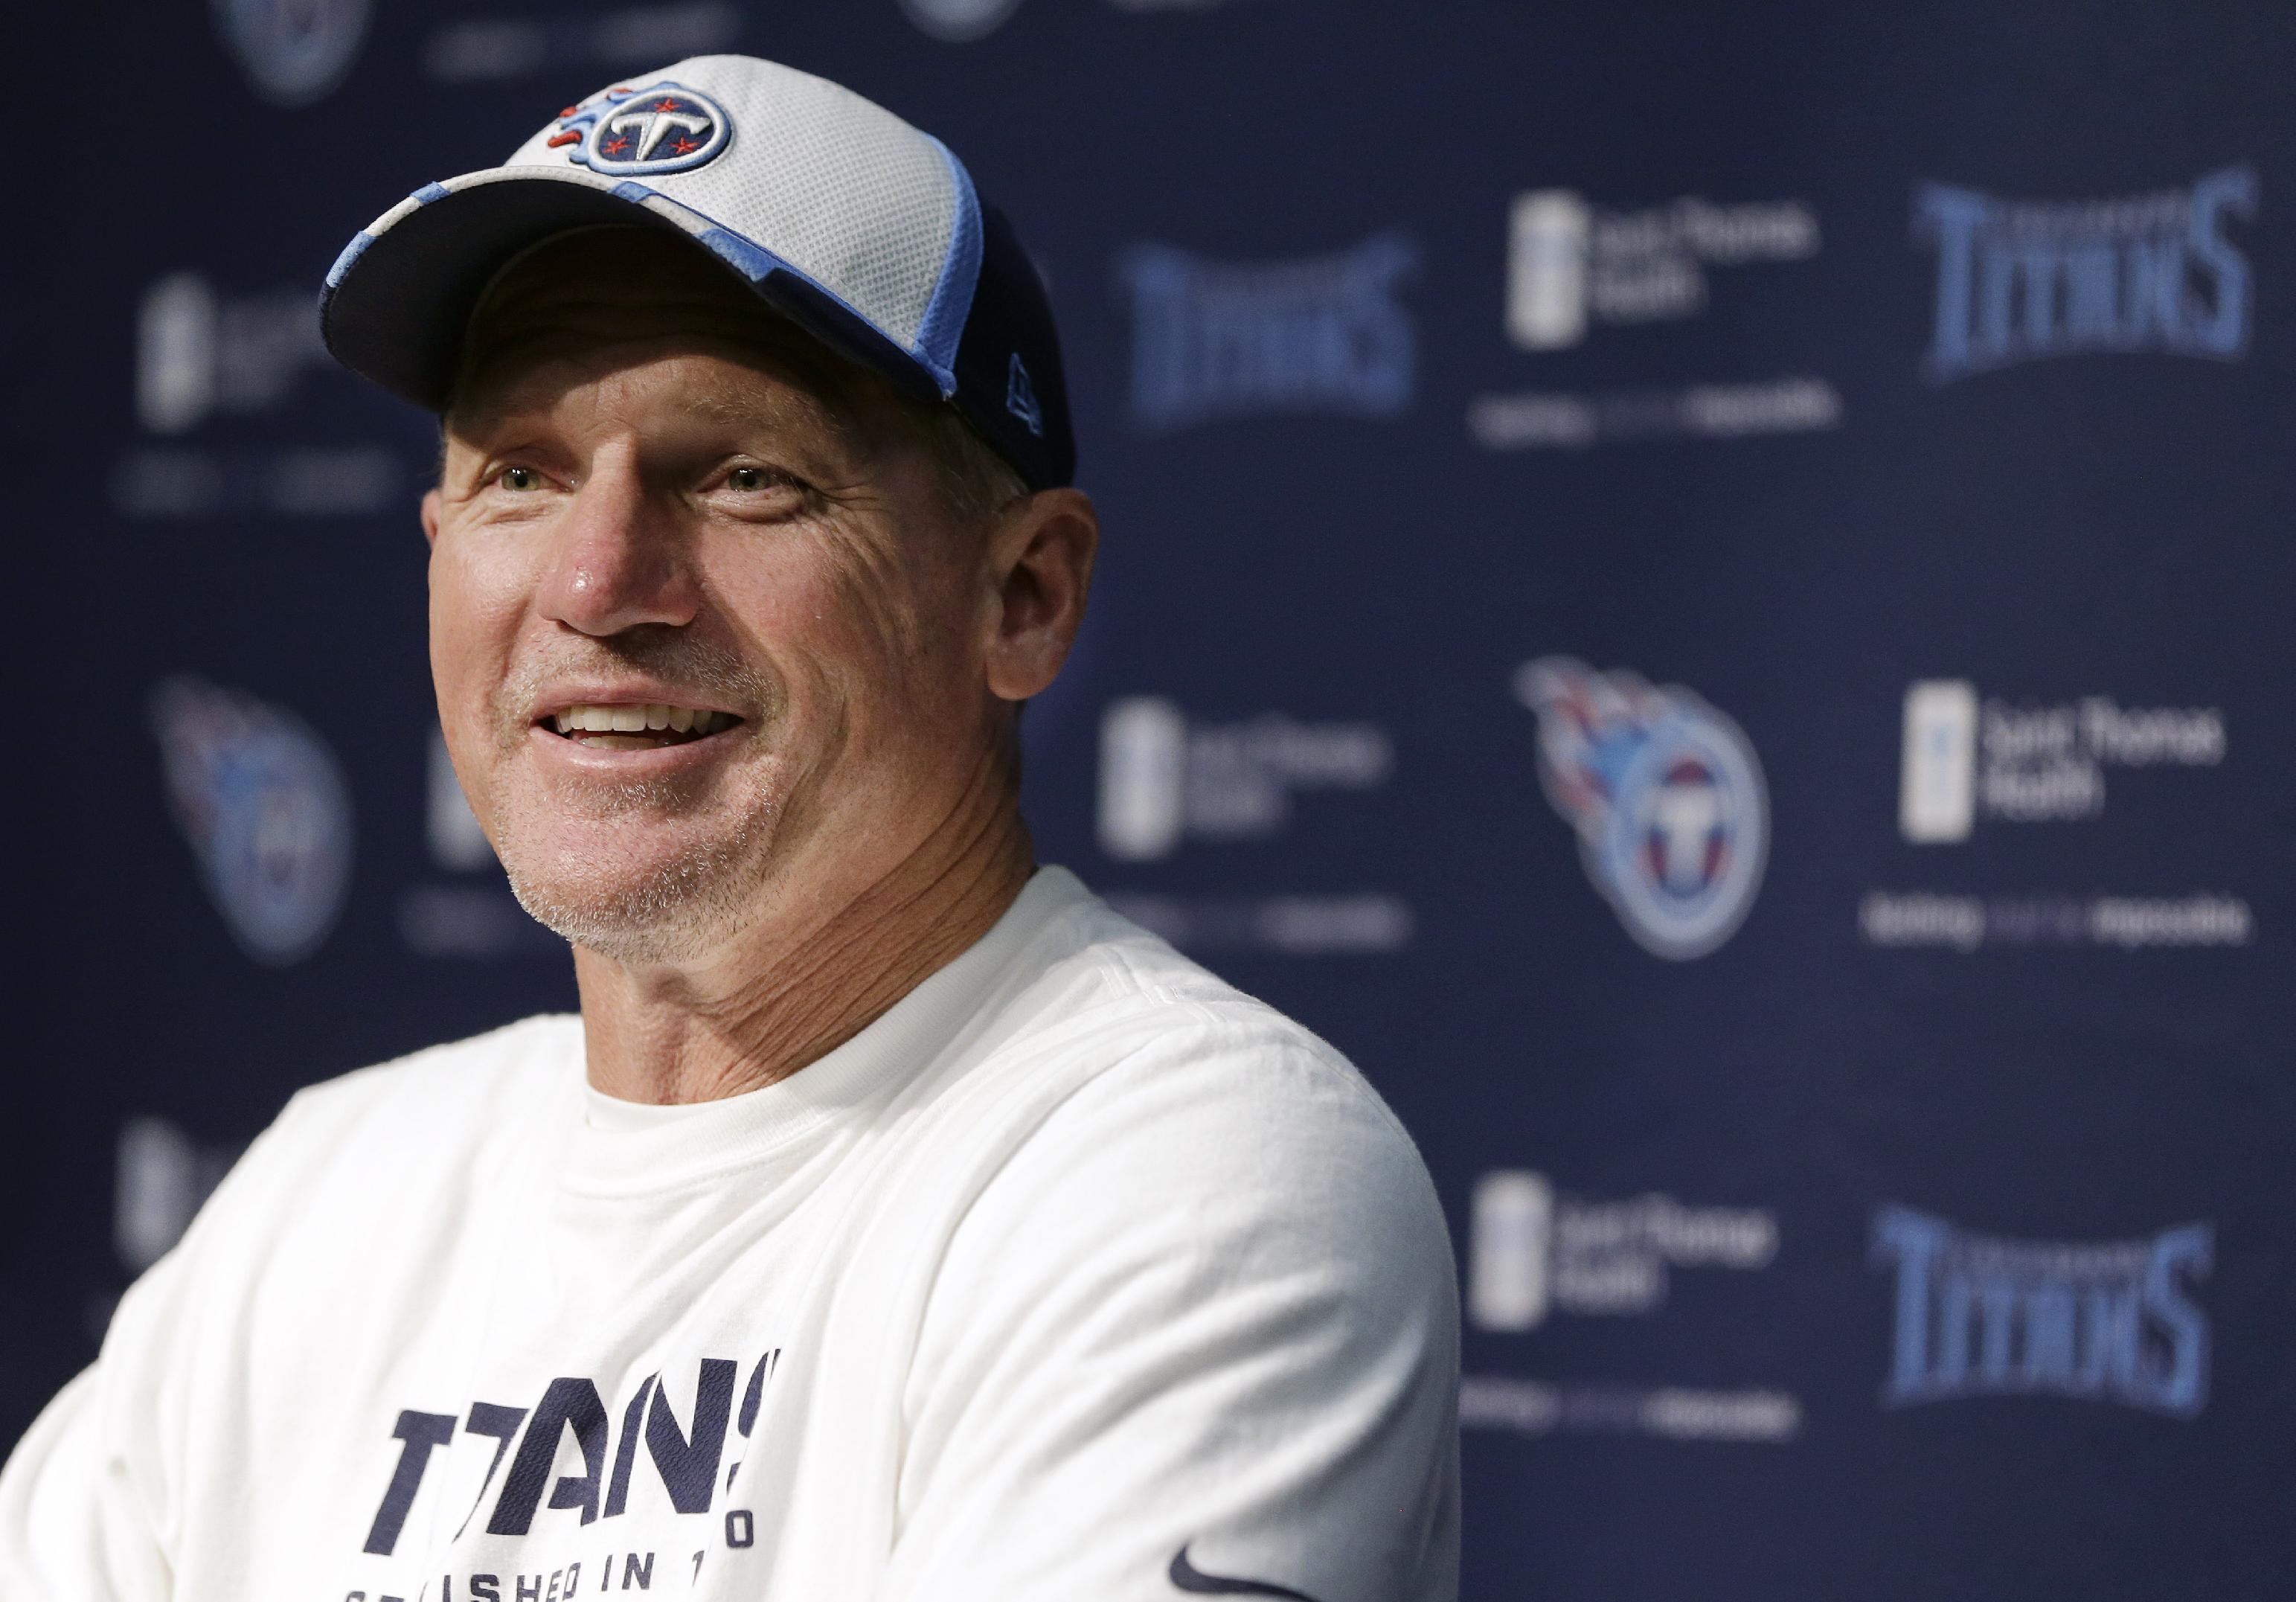 Titans hope having more winners helps turnaround